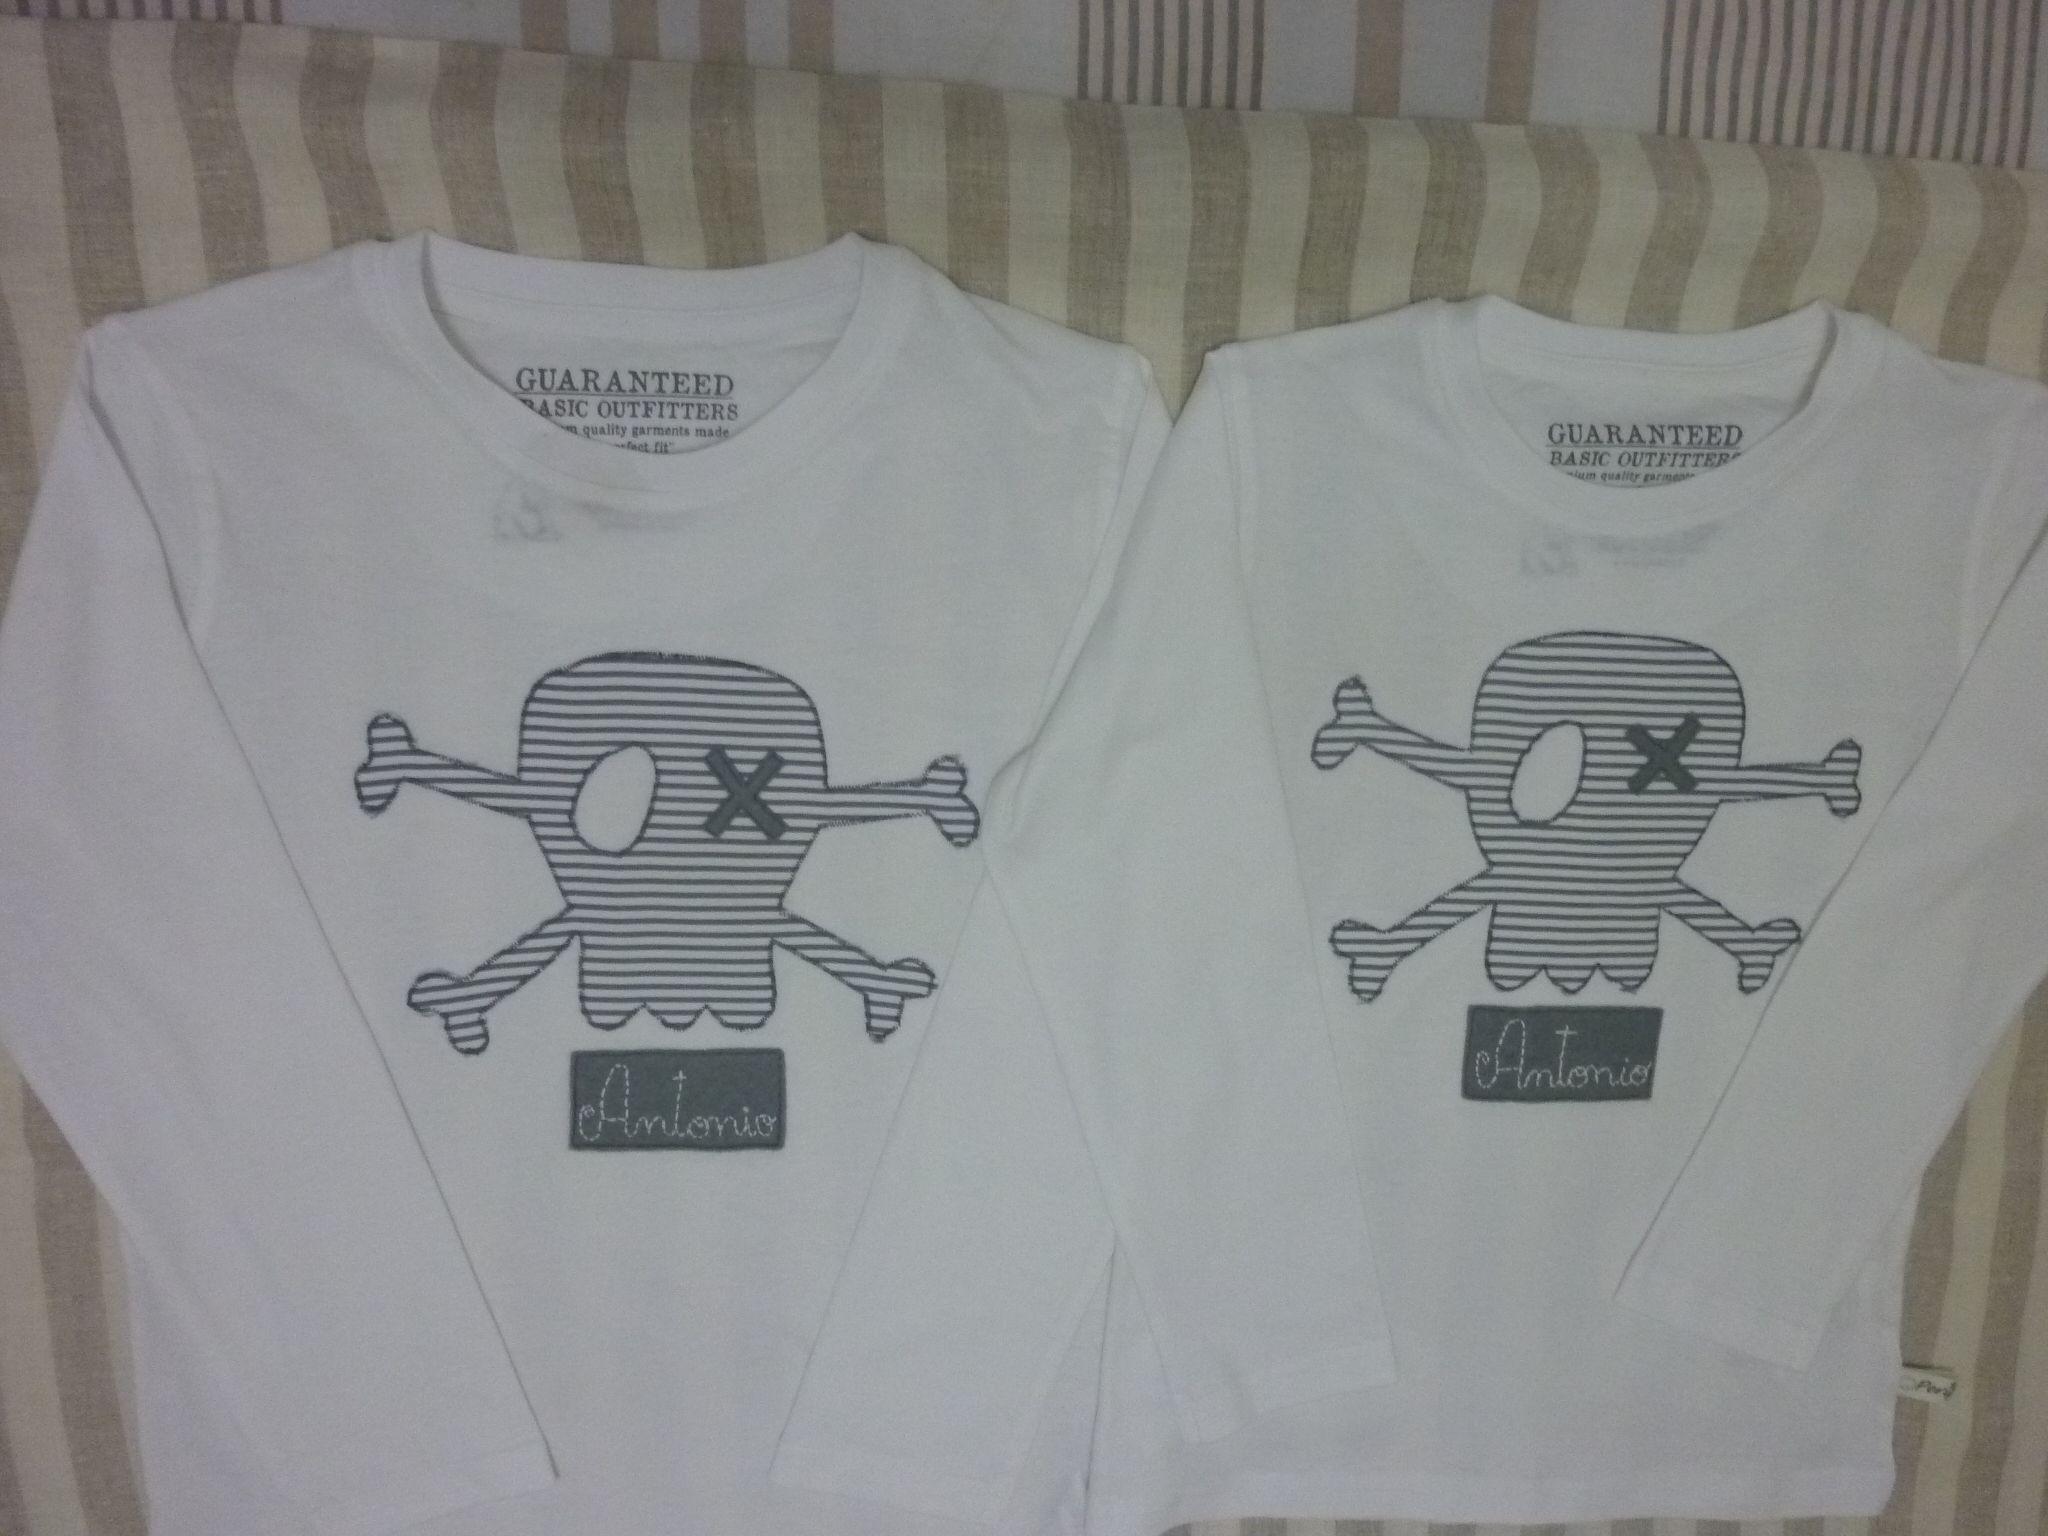 Camiseta niño calavera y nombre bordado manga larga $20 euros.